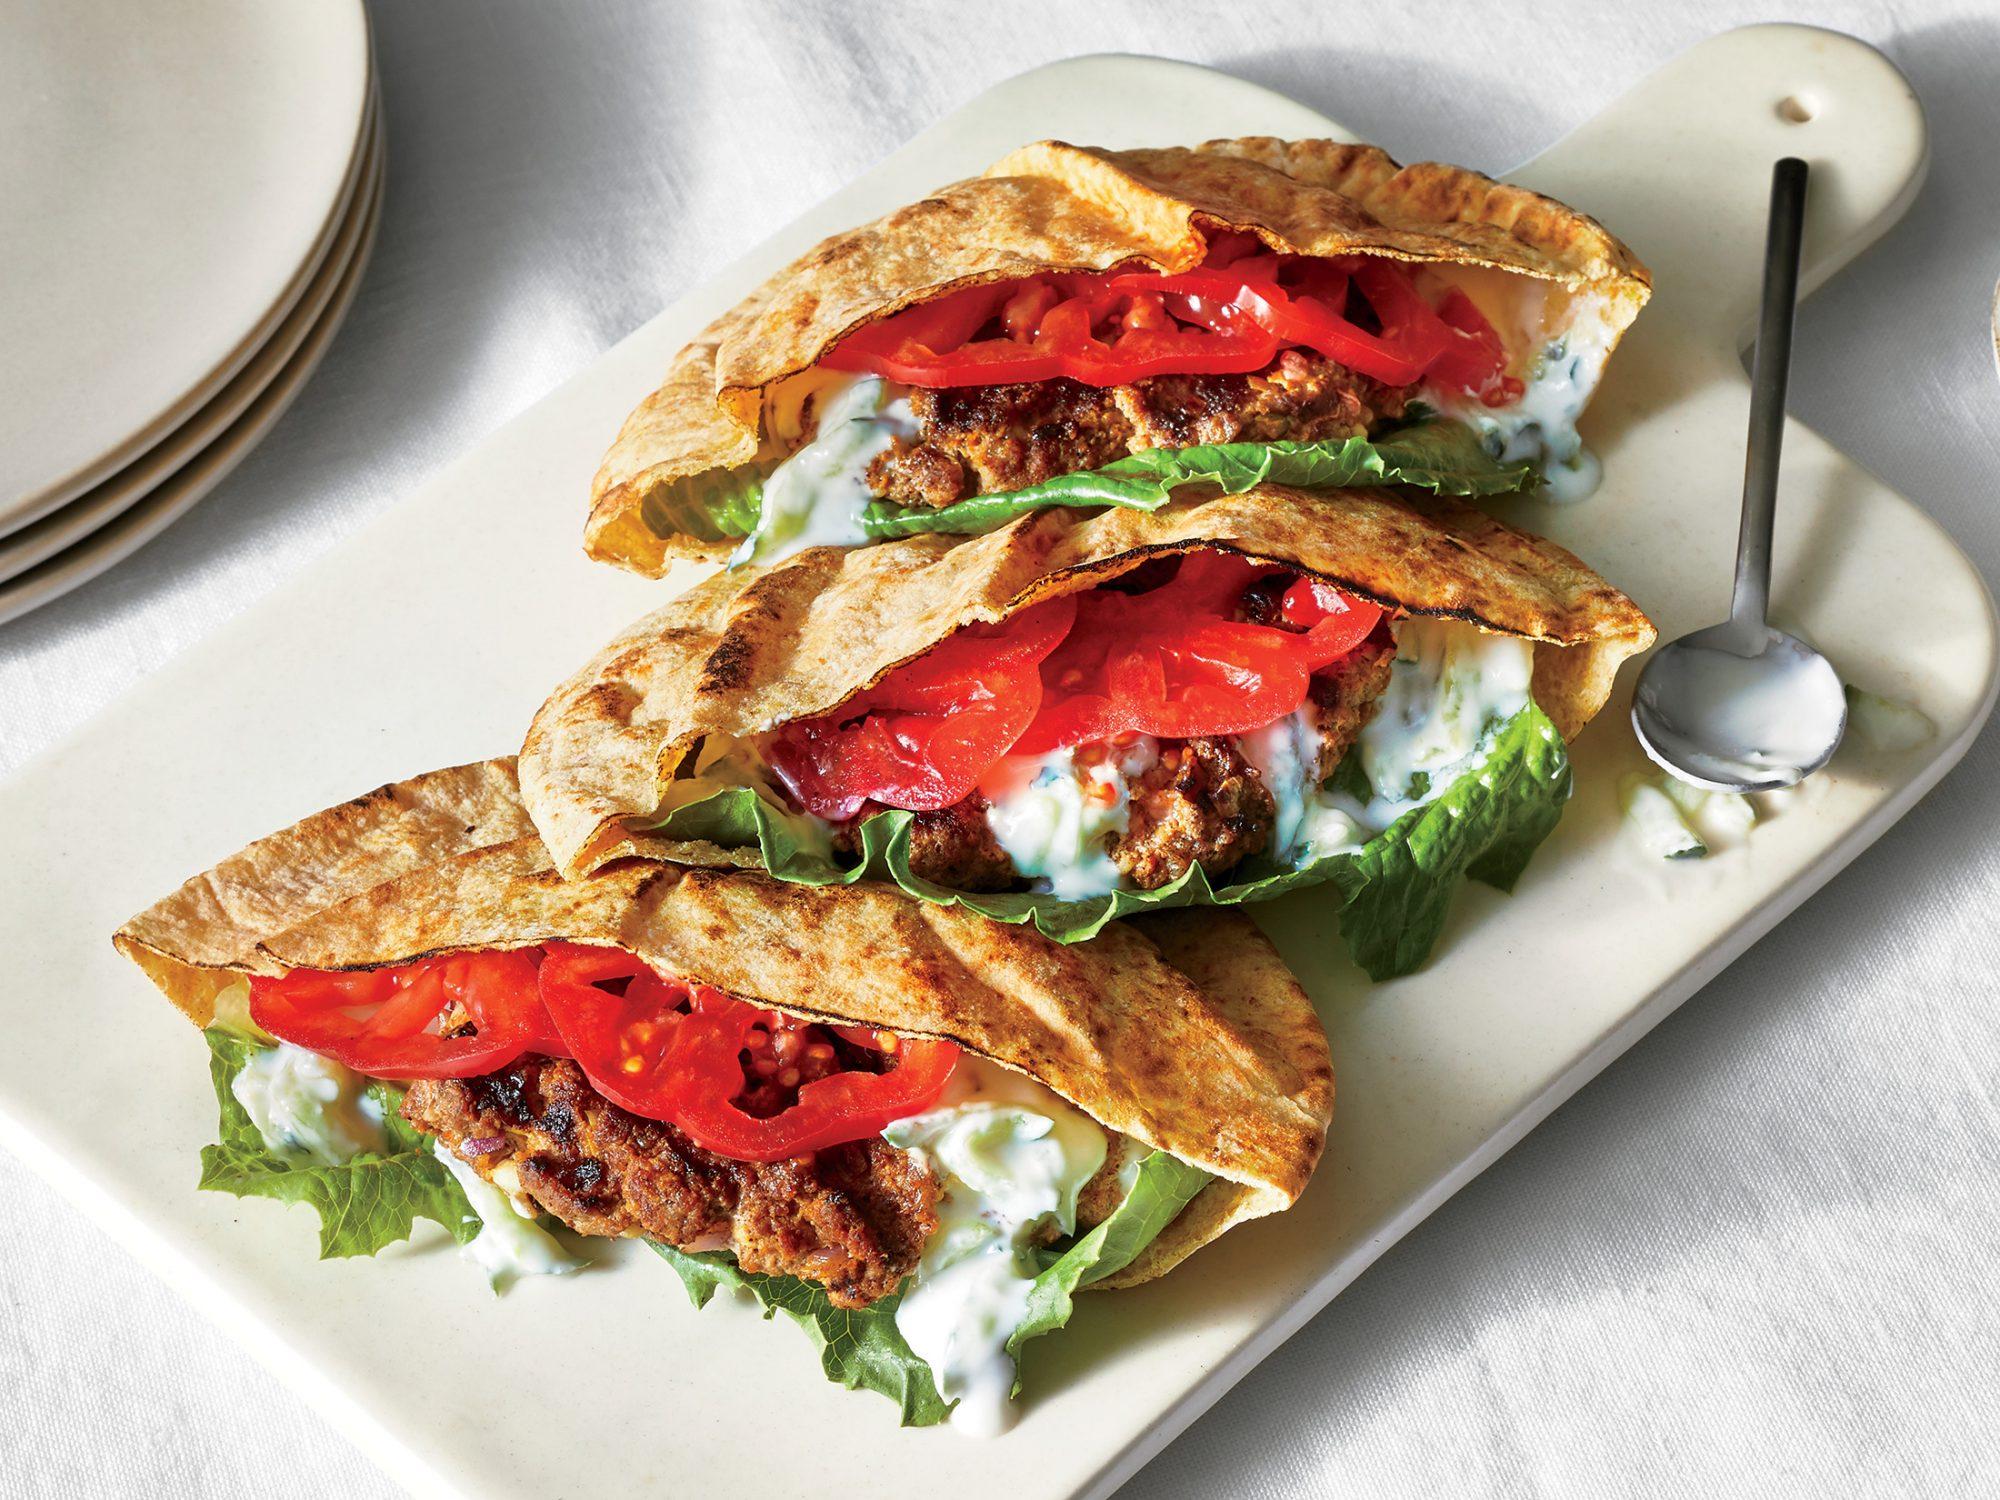 Grilled Lamb and Feta Pita Sandwiches